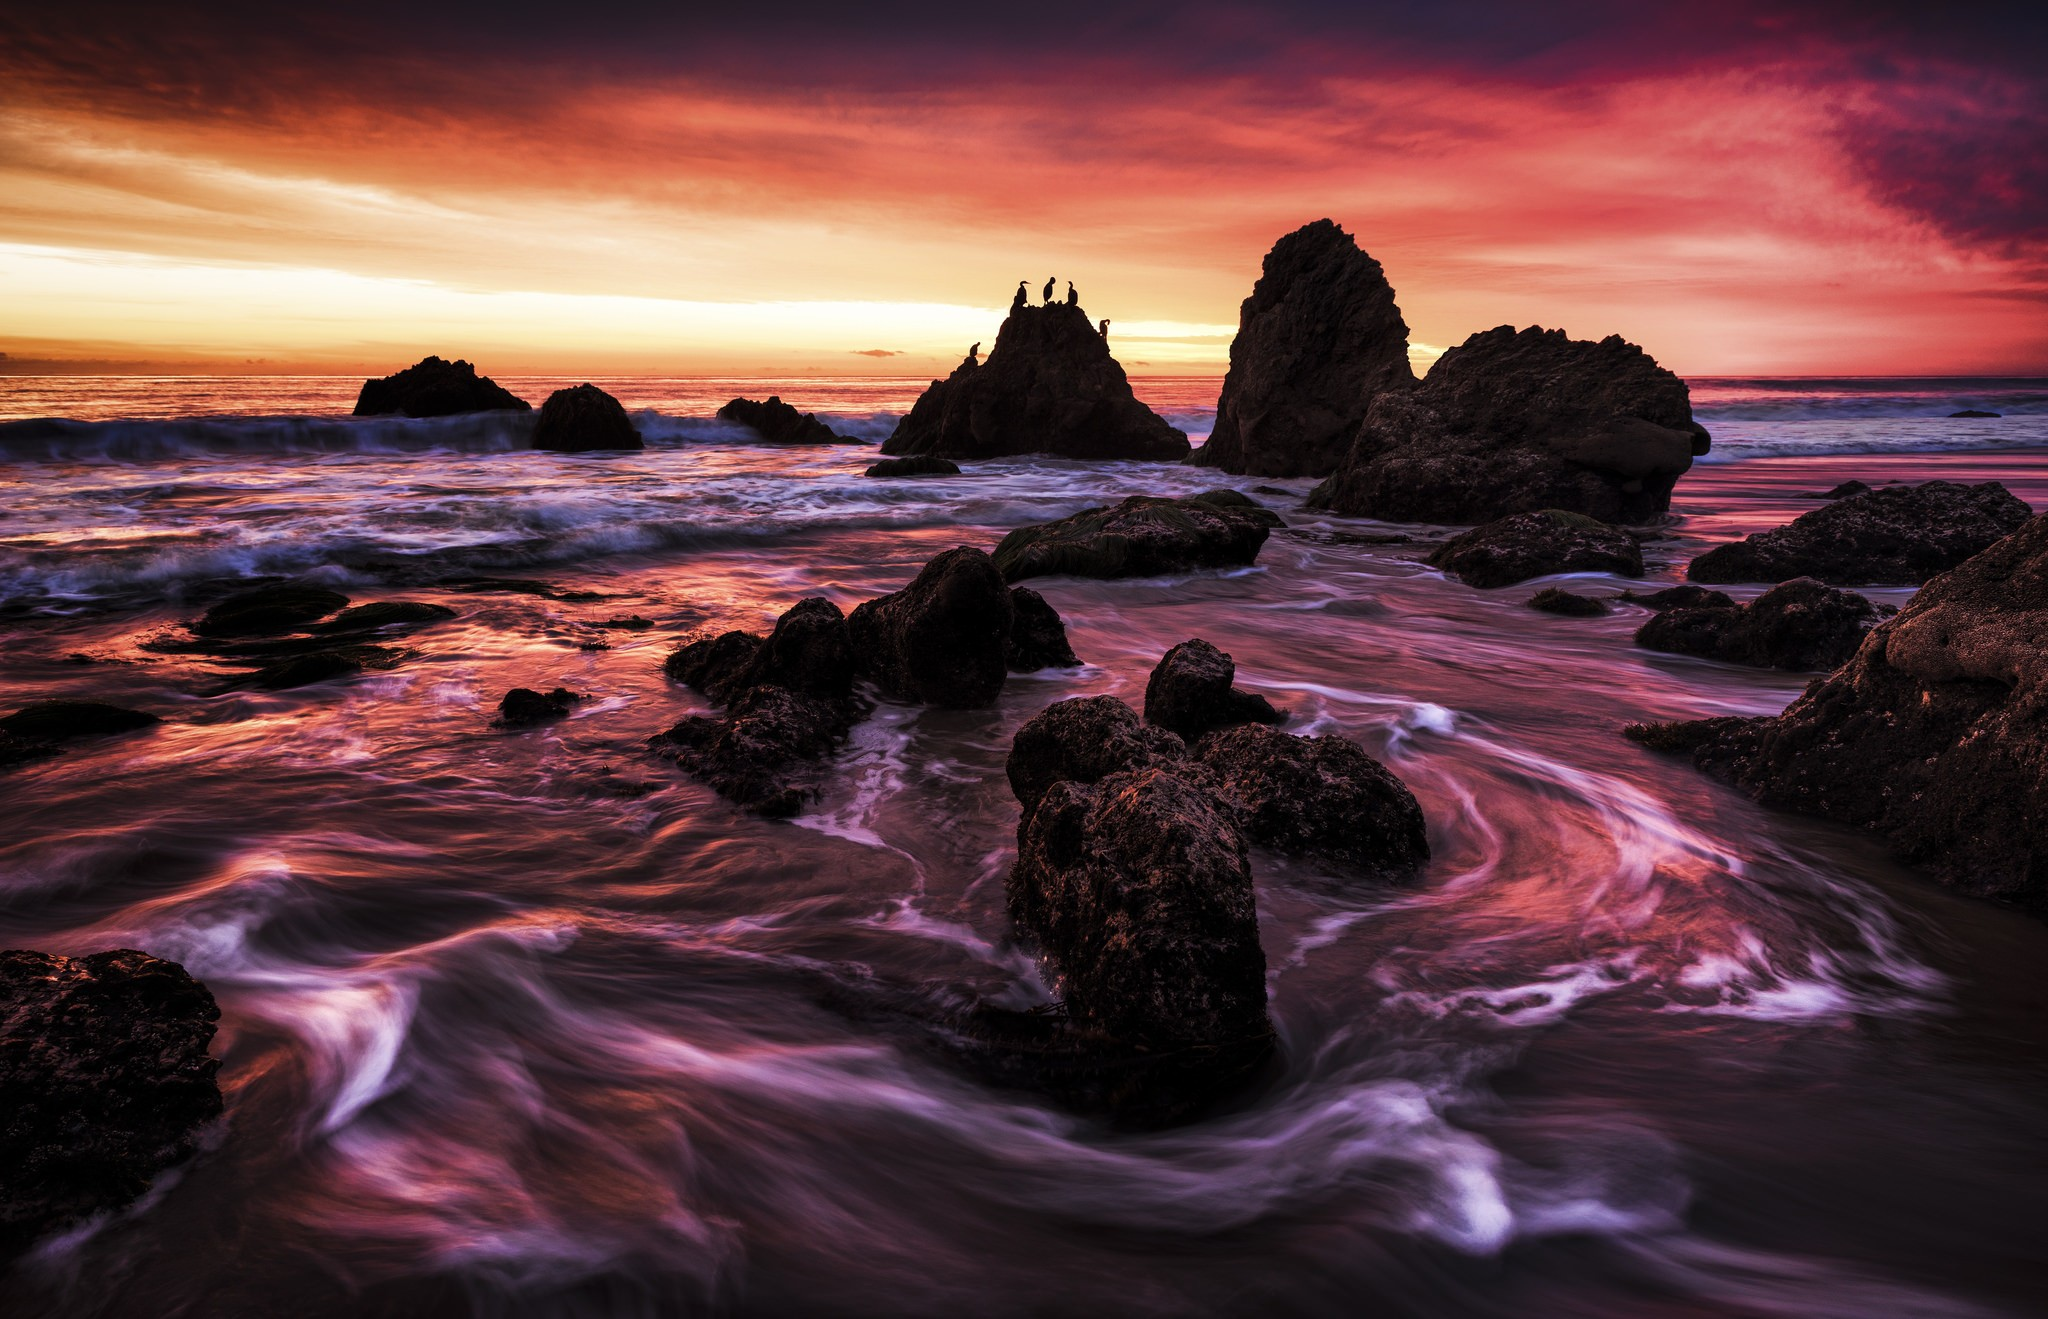 Beach Rocks Hd Wallpaper Background Image 2048x1319 Id